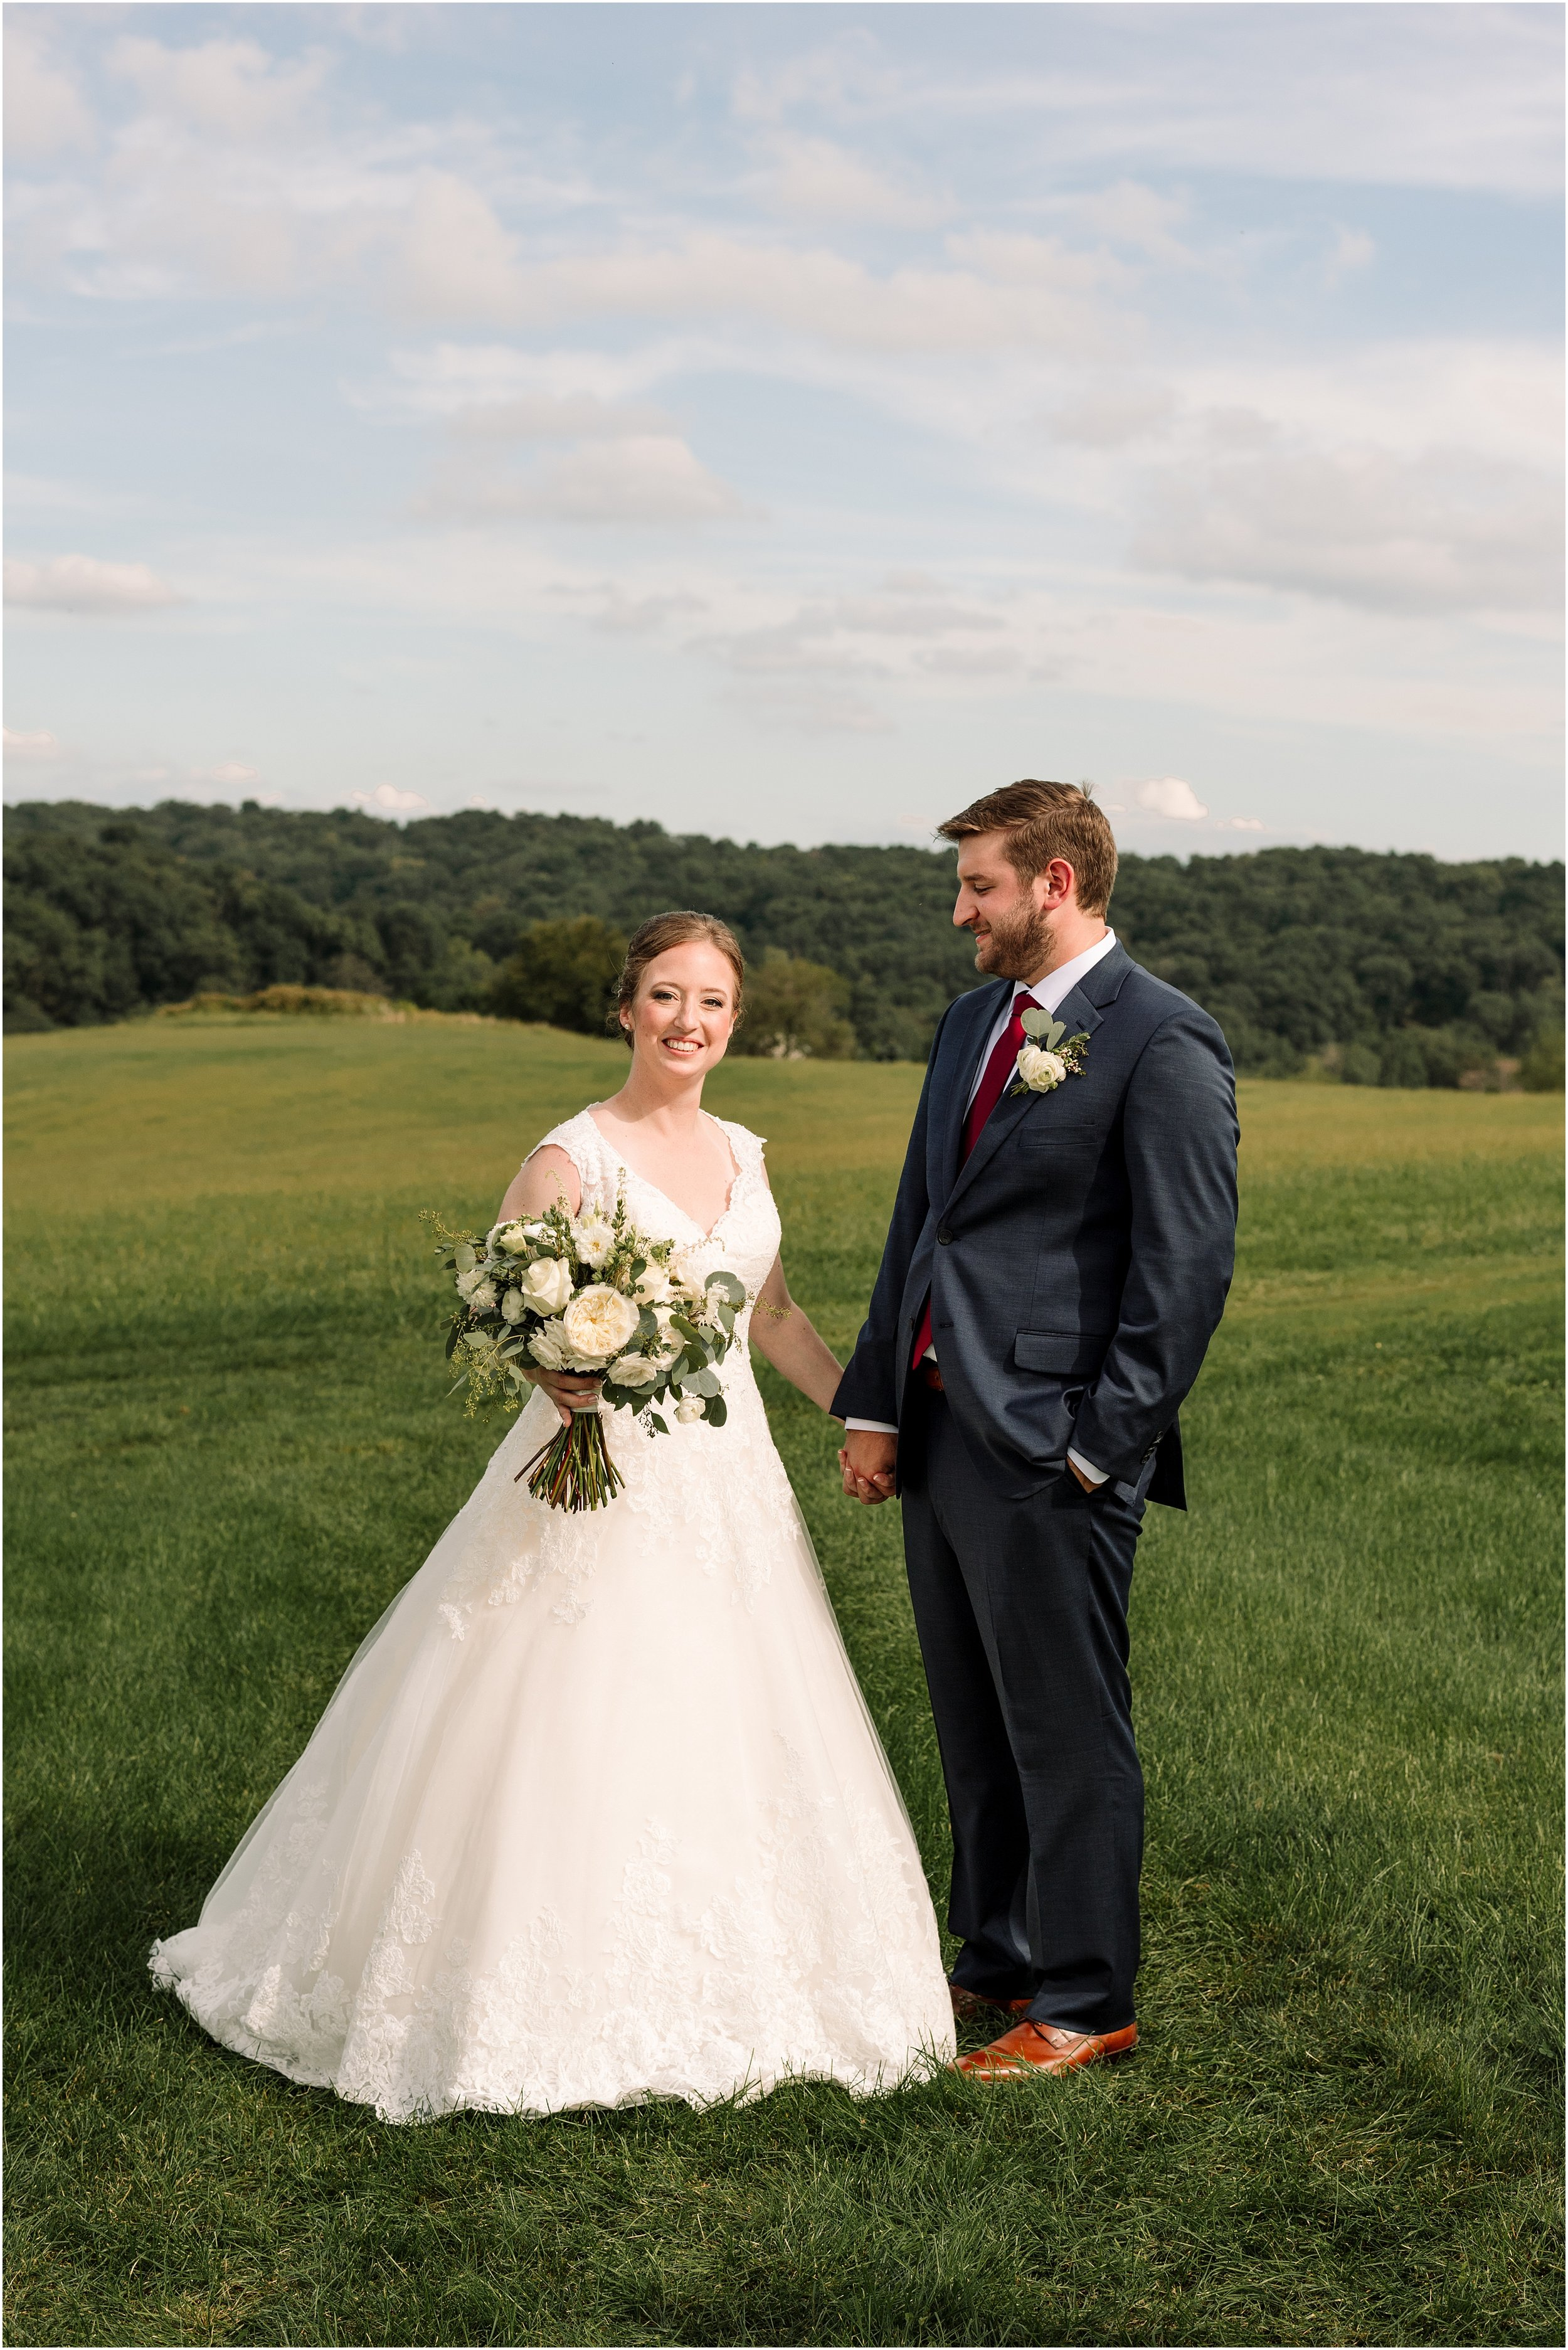 hannah leigh photography Wyndridge Farm Wedding York PA_1531.jpg